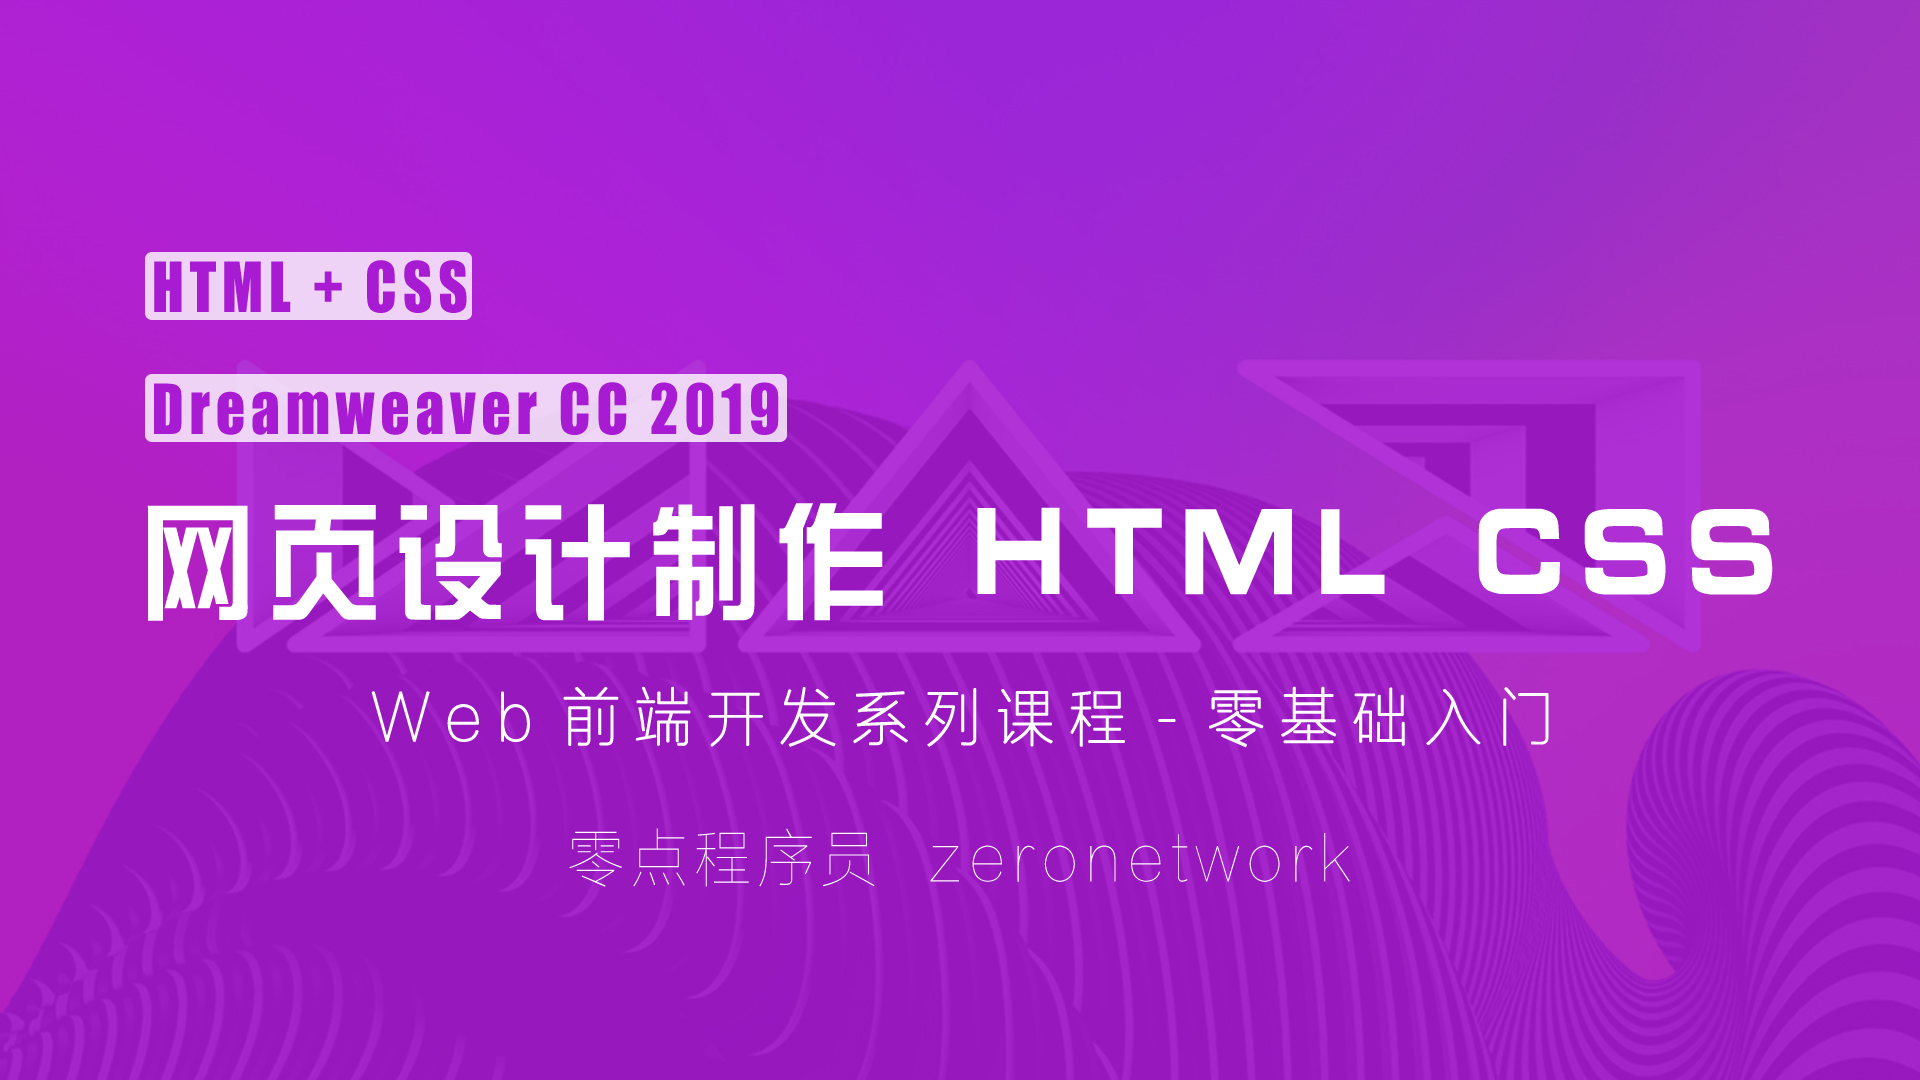 Web前端开发基础入门 Dreamweaver2019+HTML+CSS